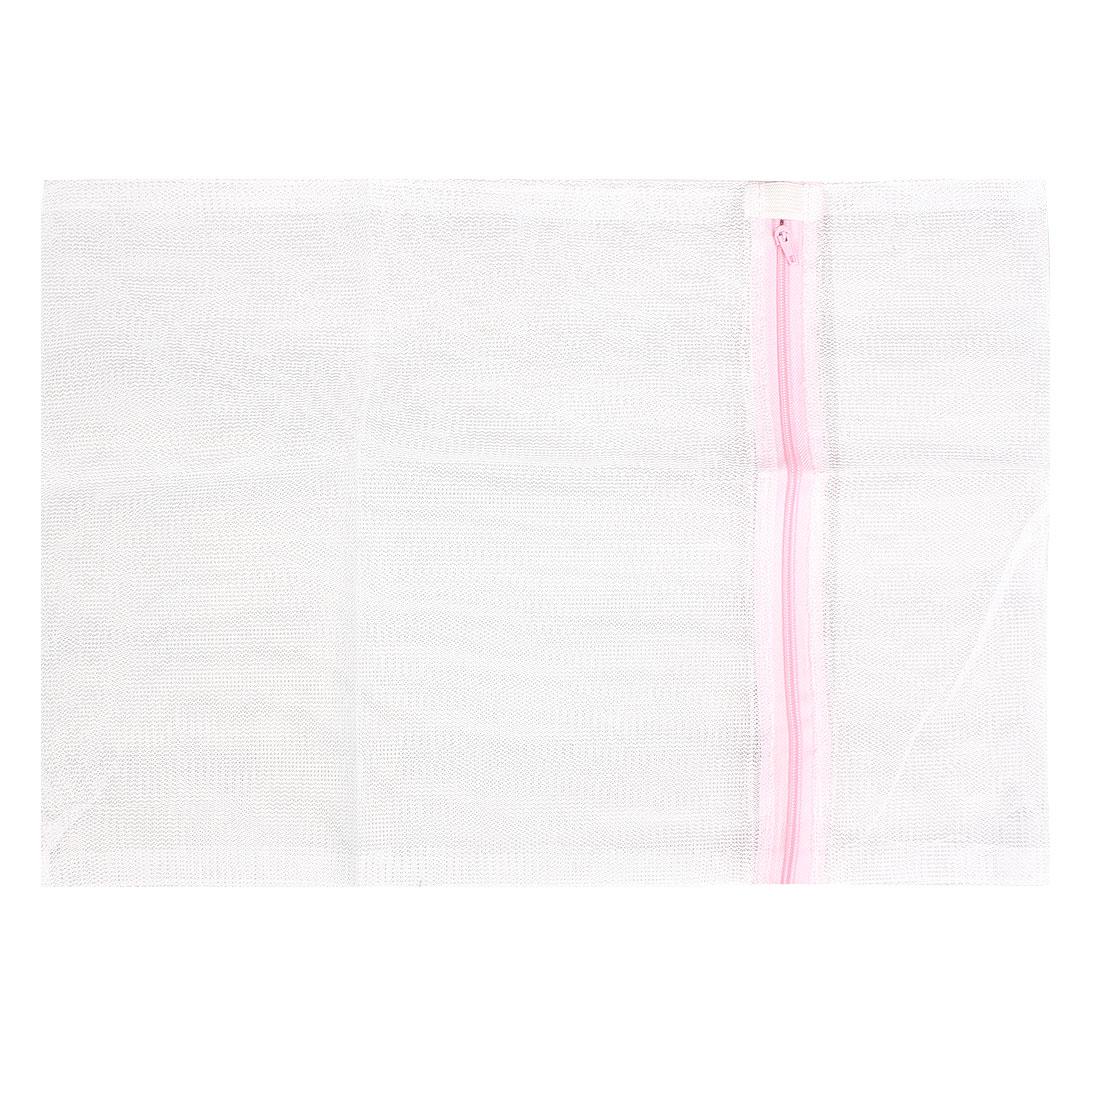 Home Laundry Zipper Nylon Washing Net Bag White 30x40cm